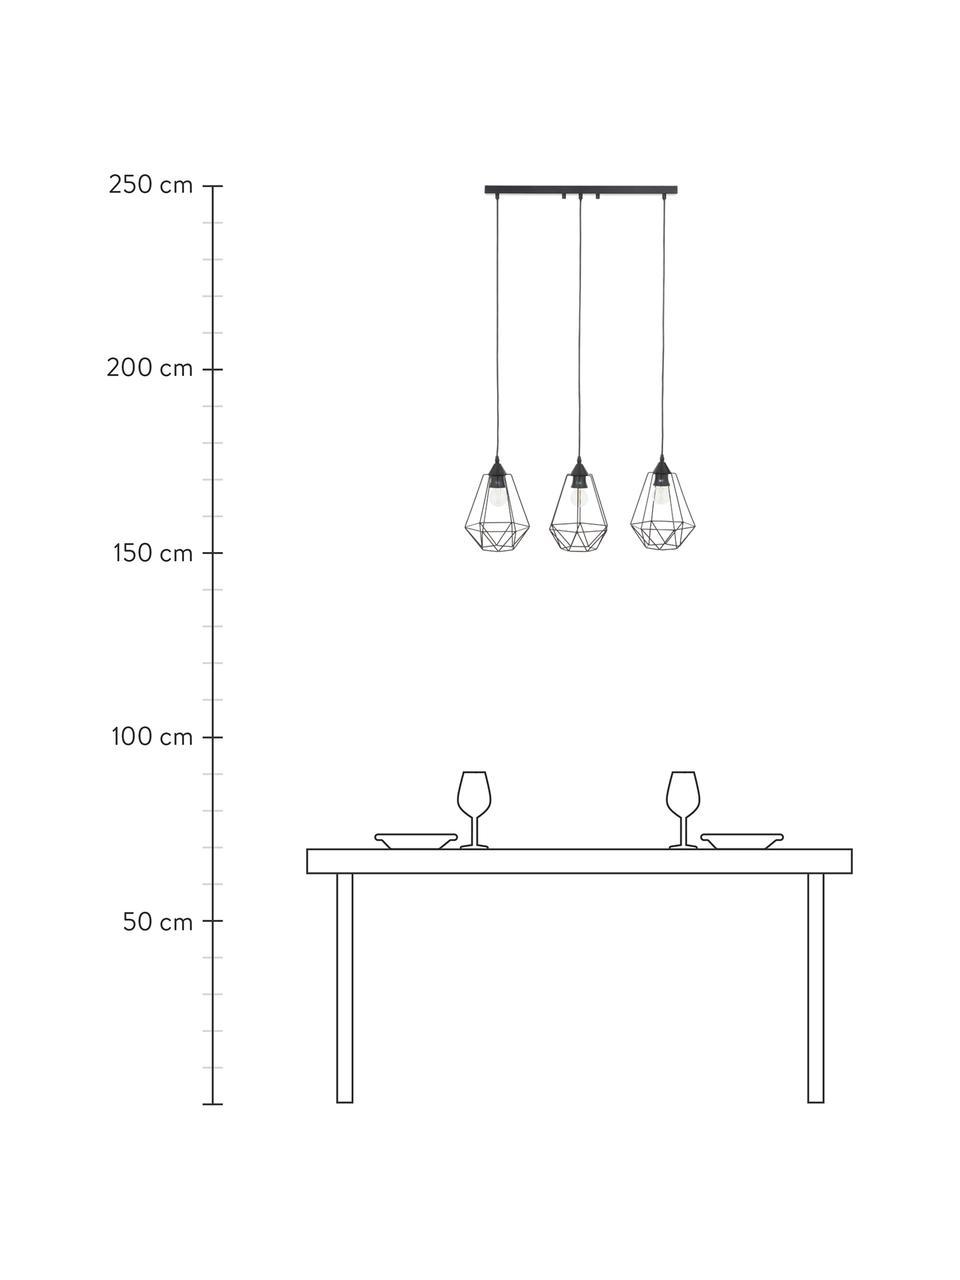 Lampada a sospensione industrial Wire, Paralume: metallo, Baldacchino: metallo, Baldacchino: nero Paralume: nero Cavo: nero, Larg. 75 x Alt. 25 cm